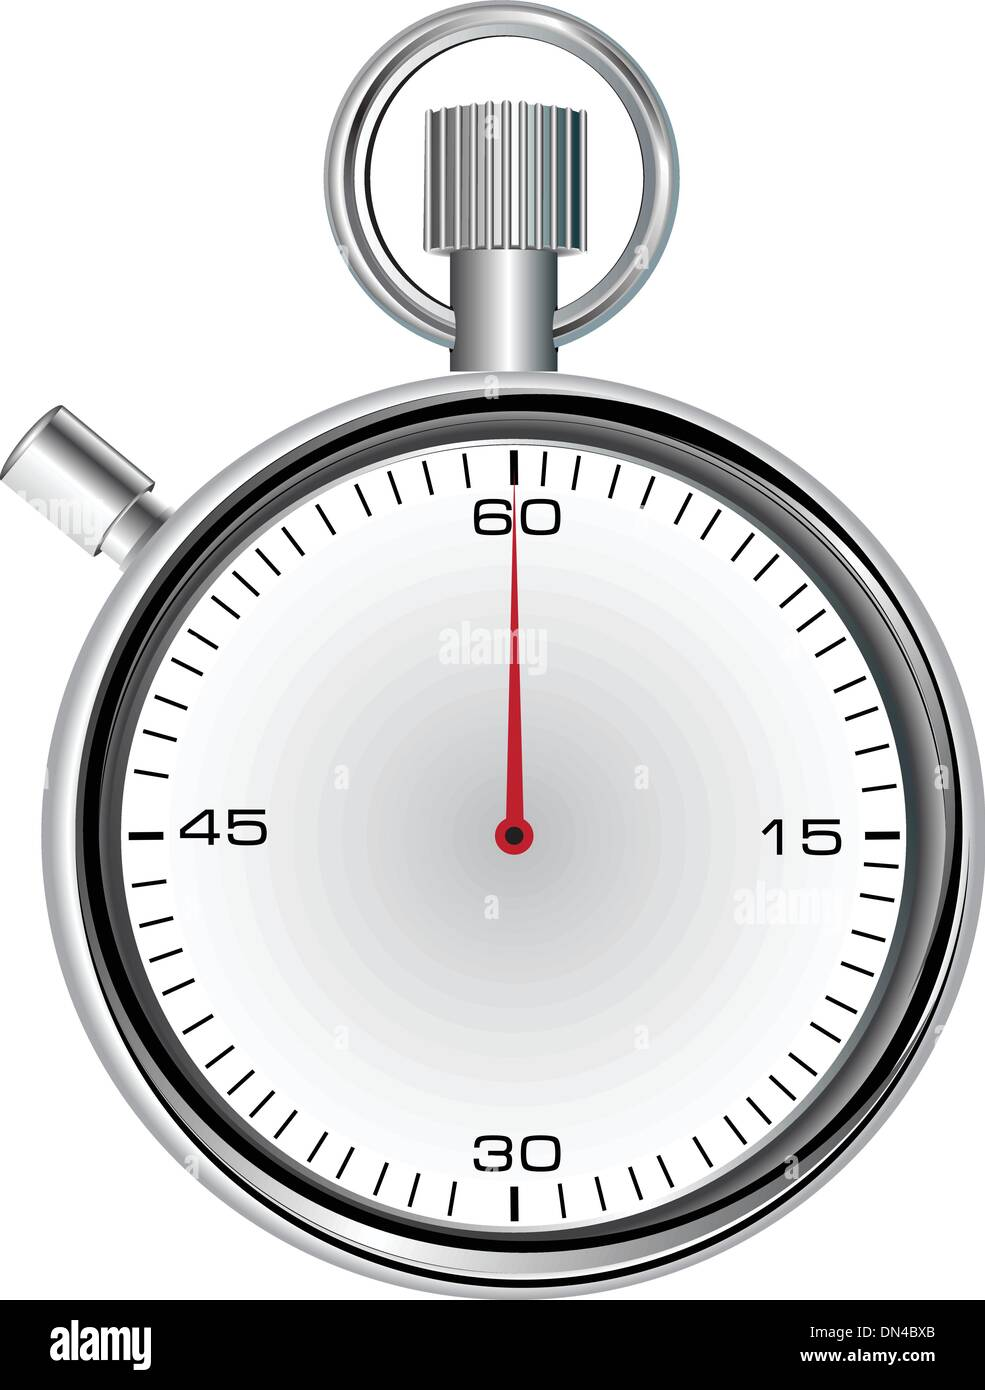 Stopwatch Stock Photos & Stopwatch Stock Images - Alamy